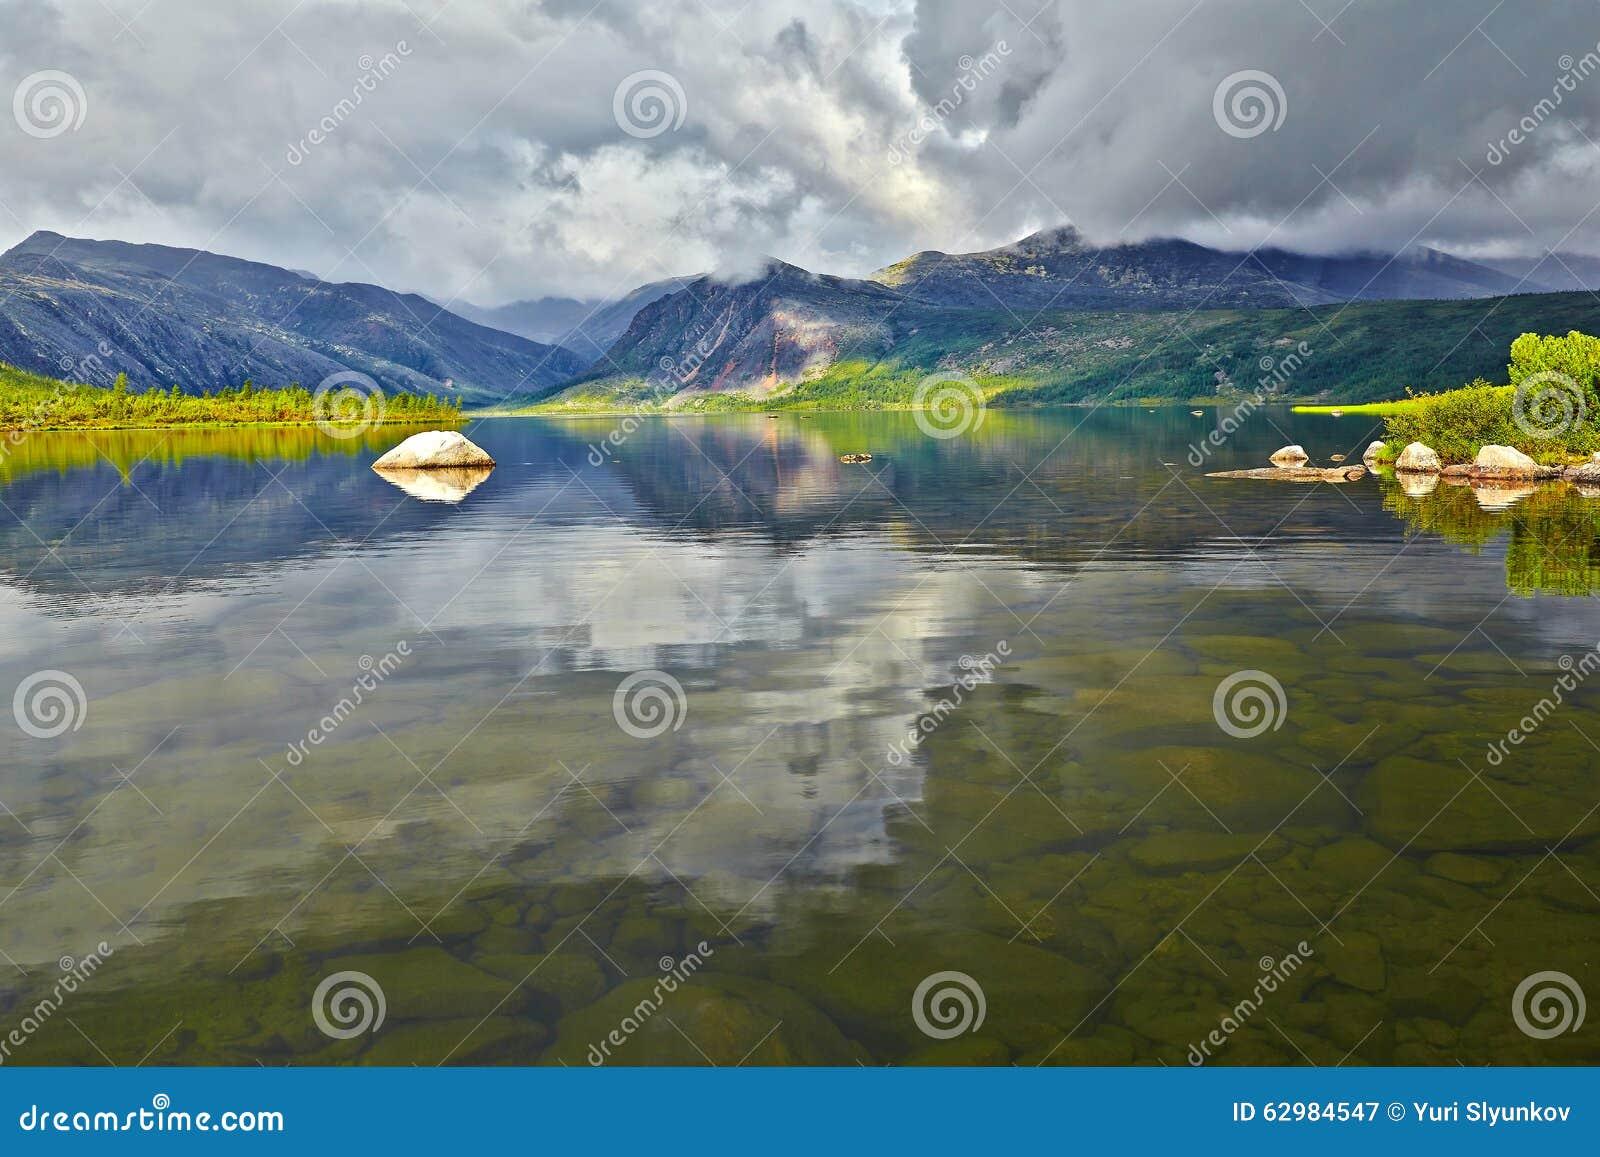 Jack London s lake. Summer, reflexions